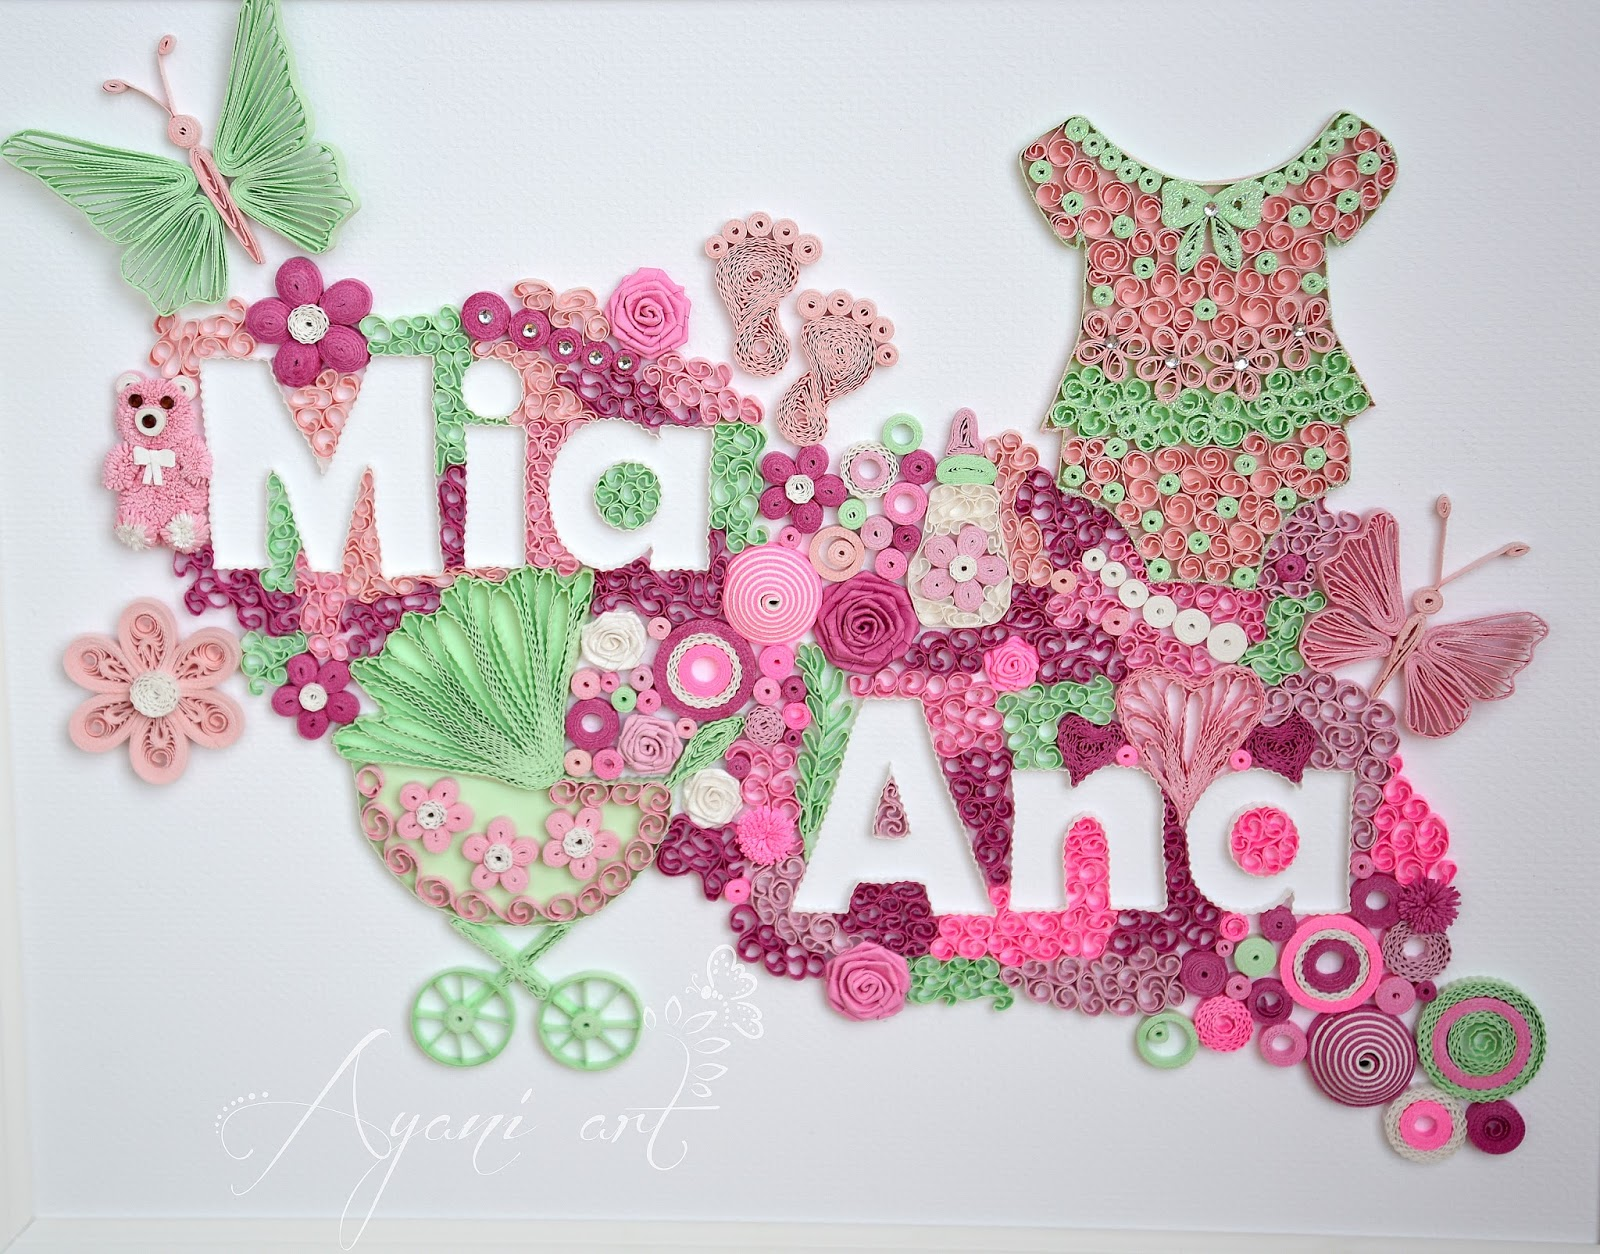 Ayani art: Quilling baby girl name